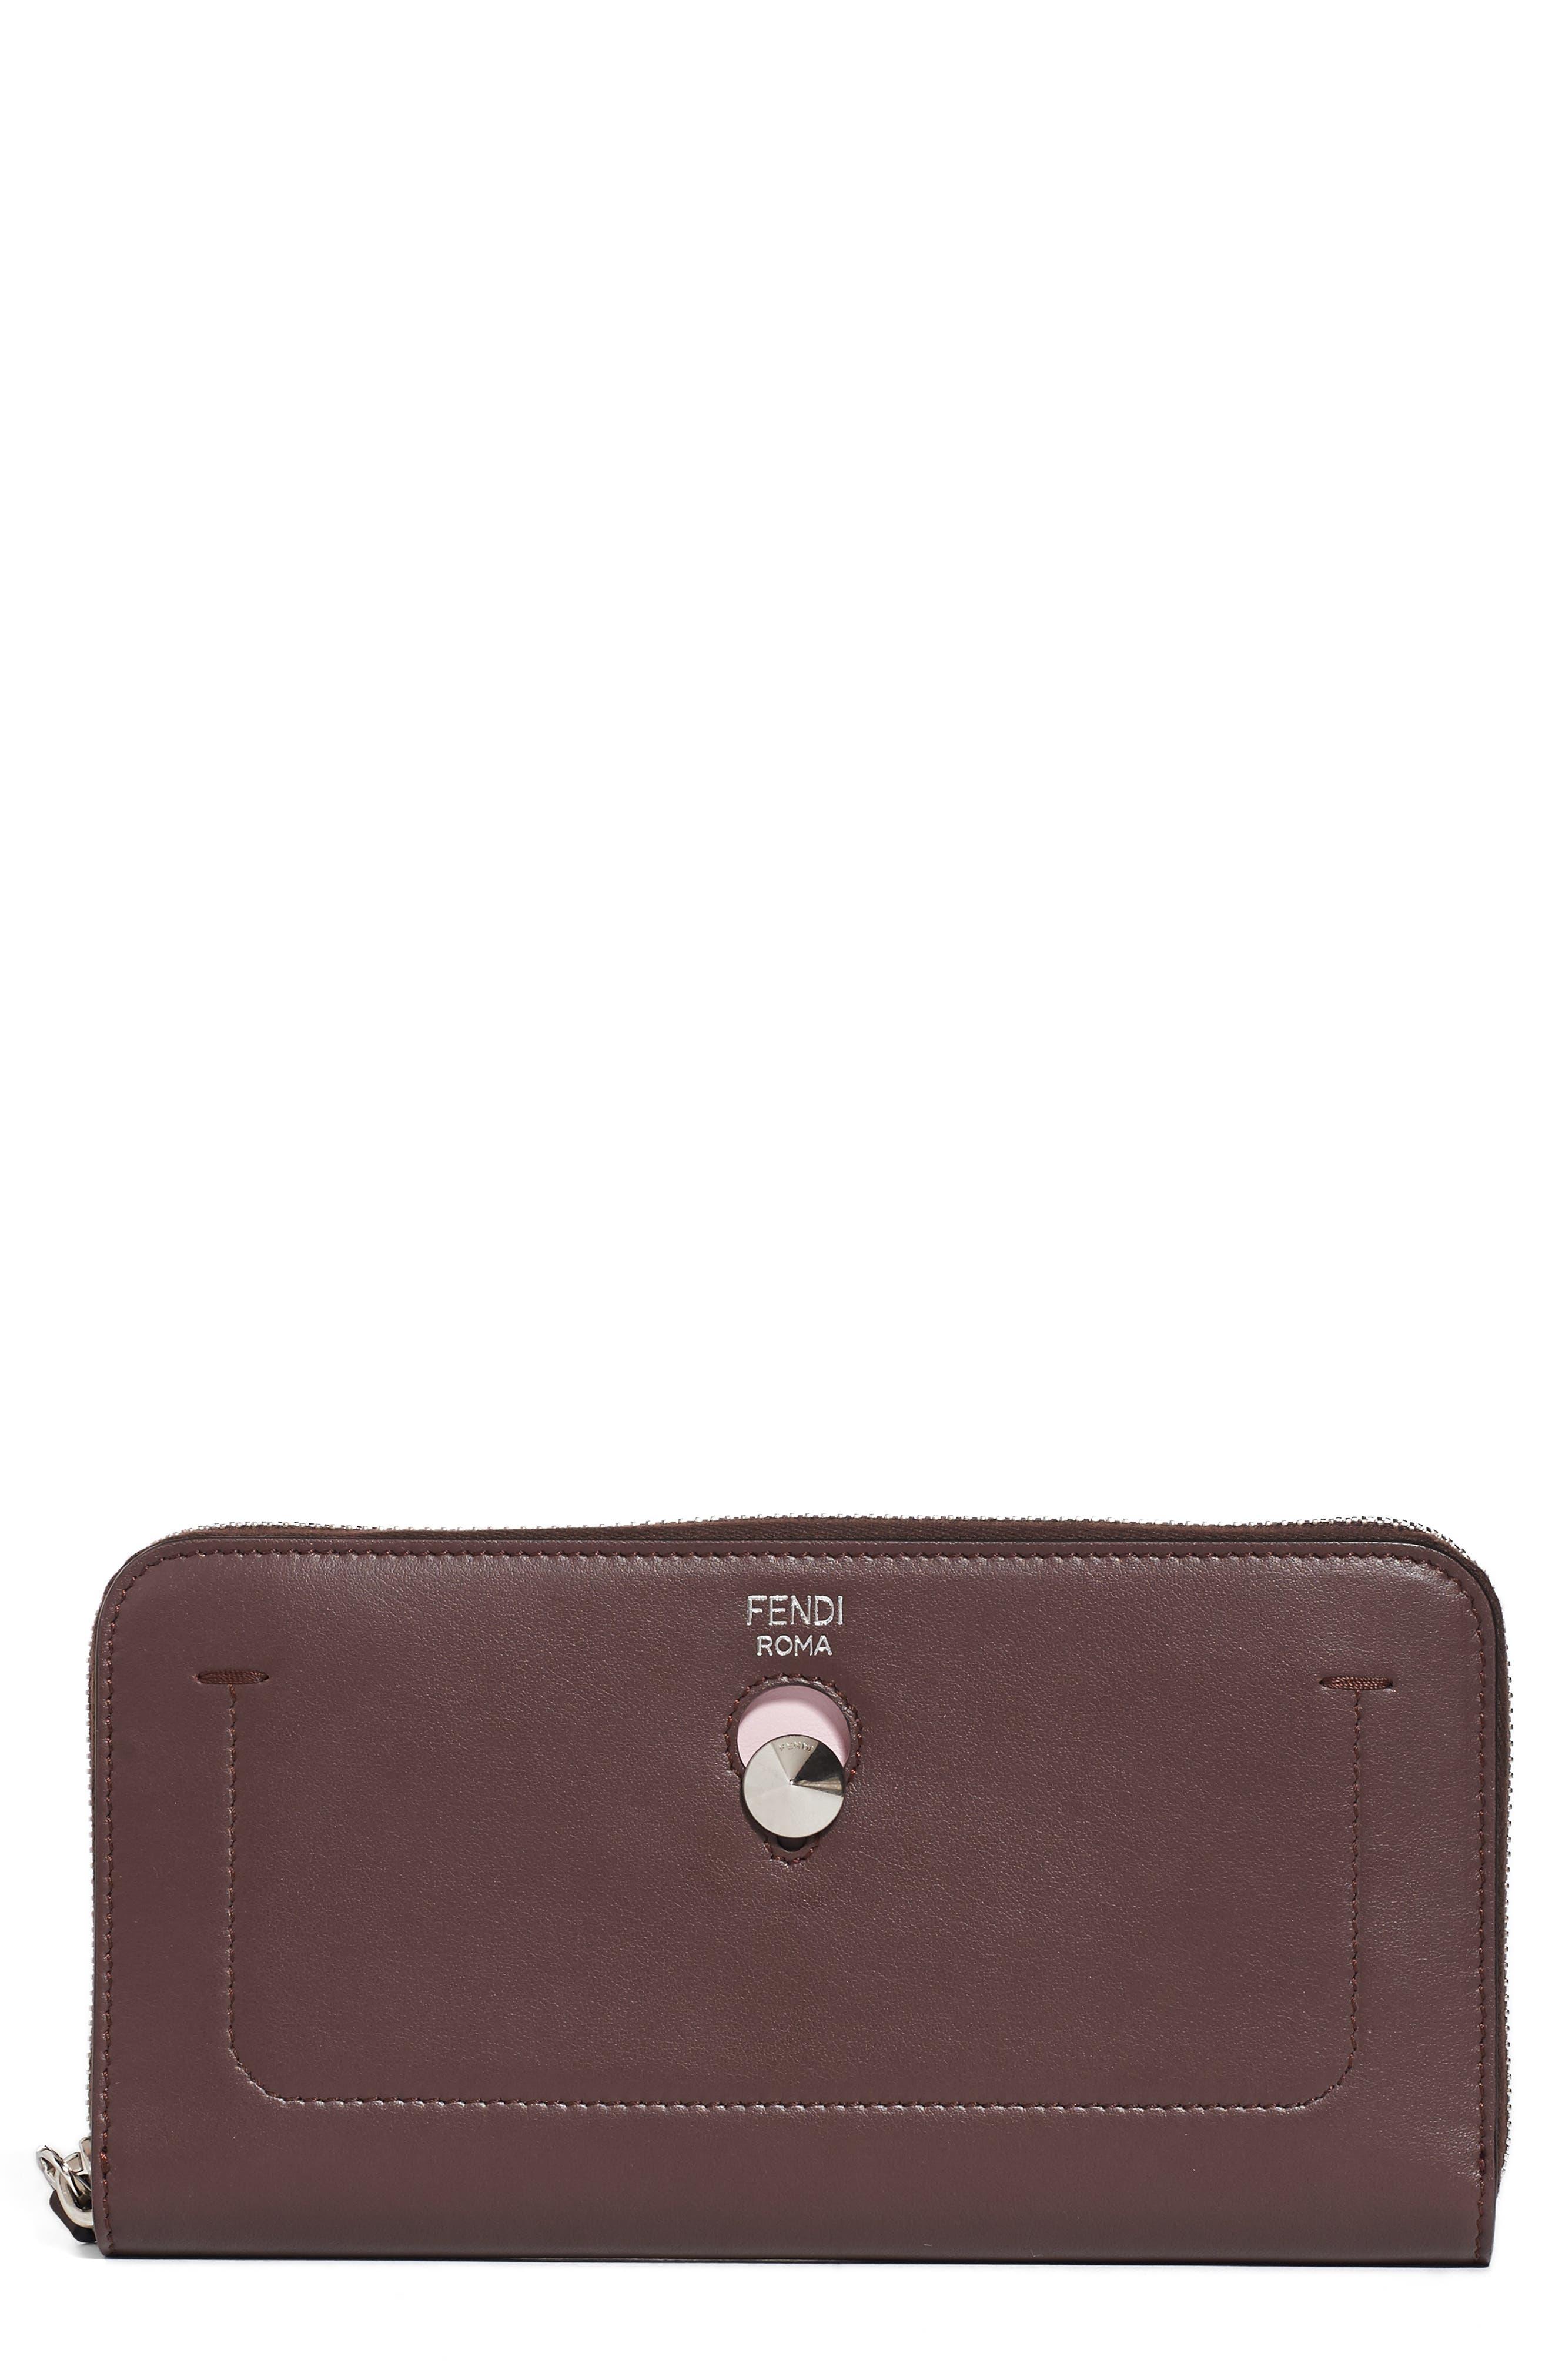 Main Image - Fendi Dotcom Calfskin Leather Clutch Wallet